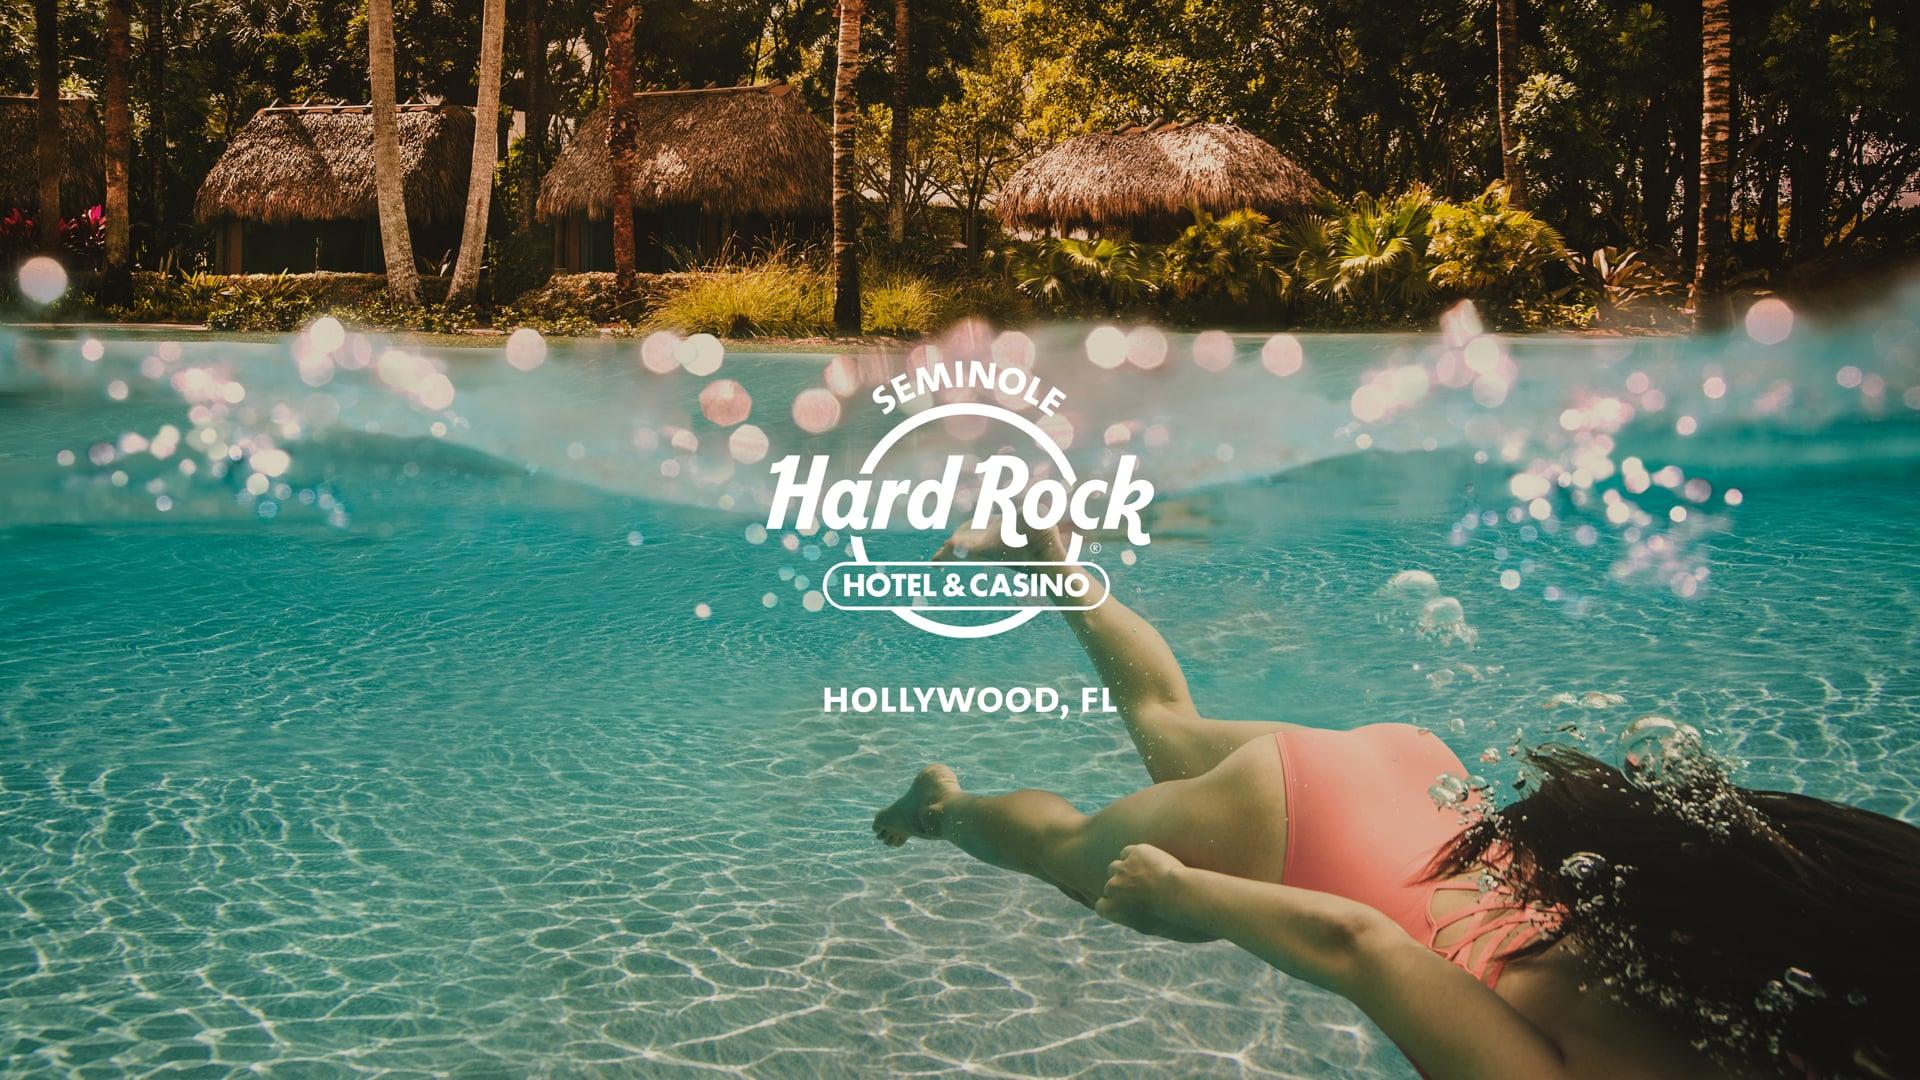 Hard Rock Hotel & Casino | Tropical Oasis